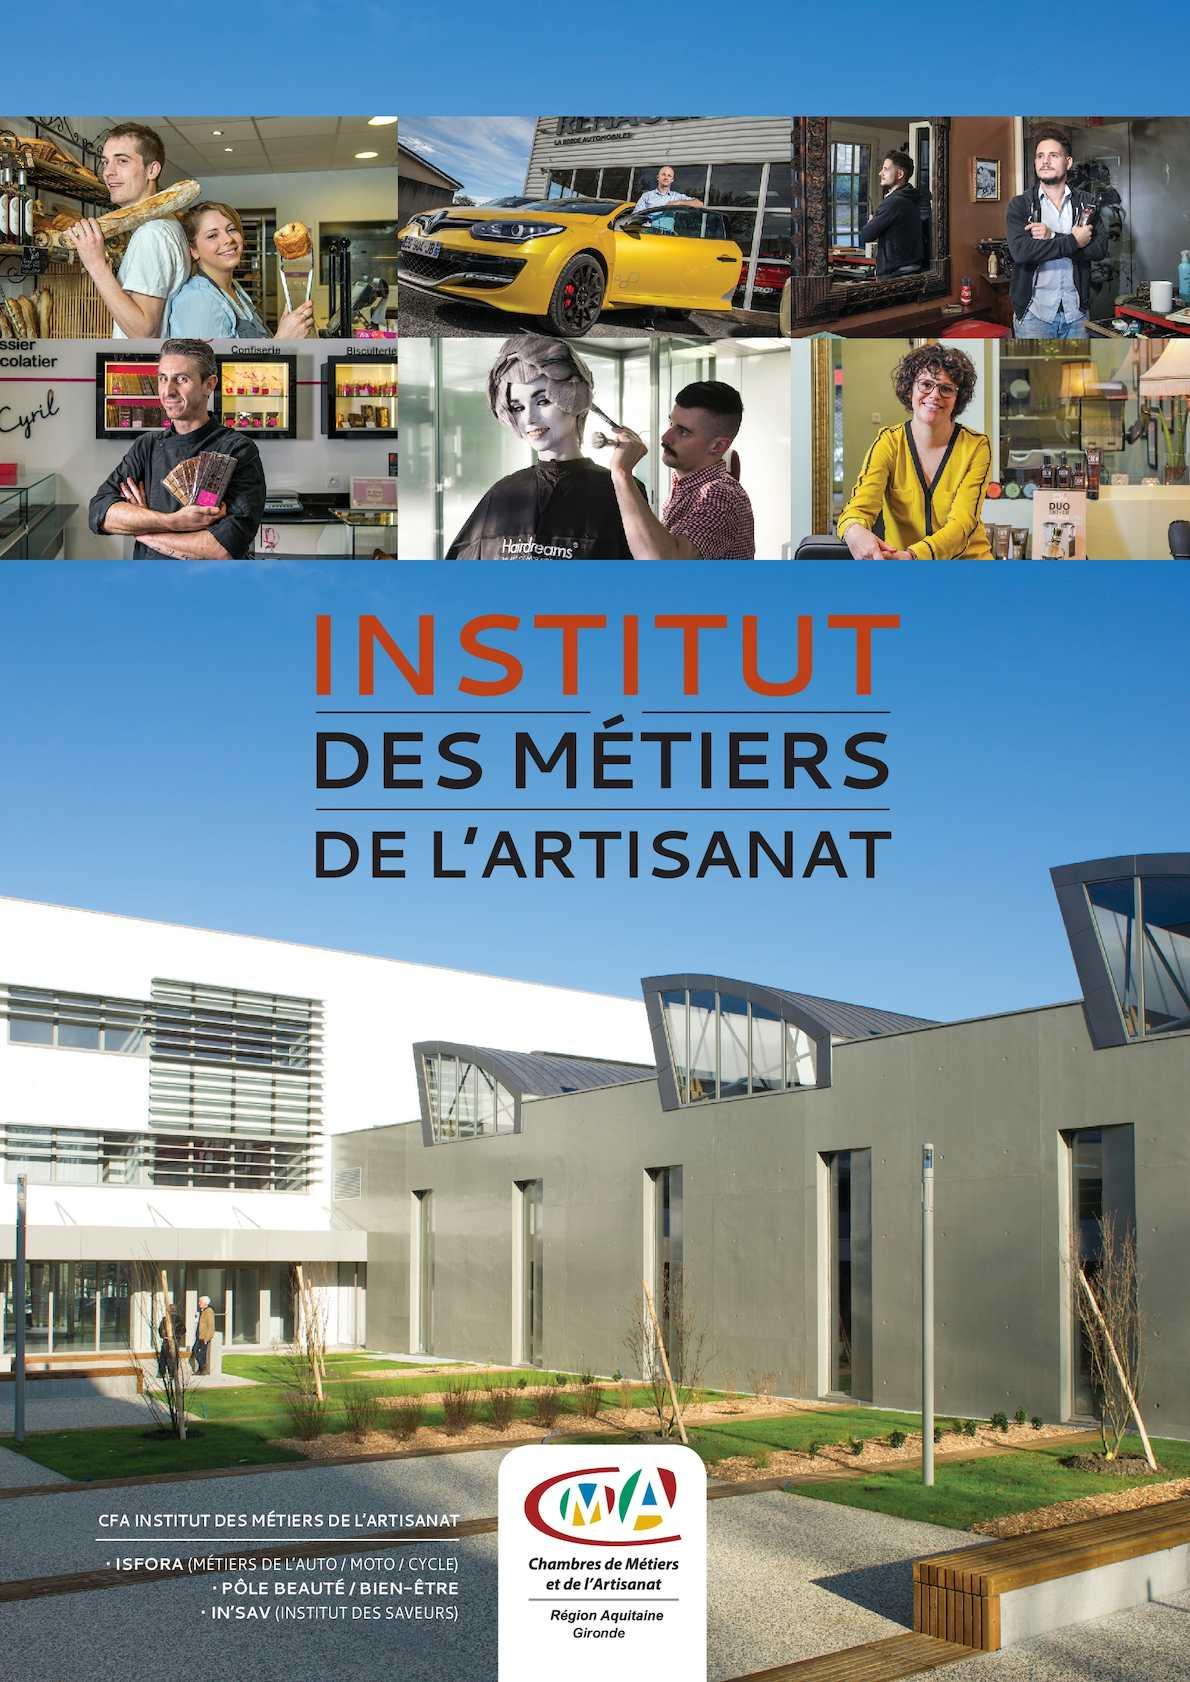 Calam o l 39 institut des metiers de l 39 artisanat - Chambre des metiers et de l artisanat bordeaux ...